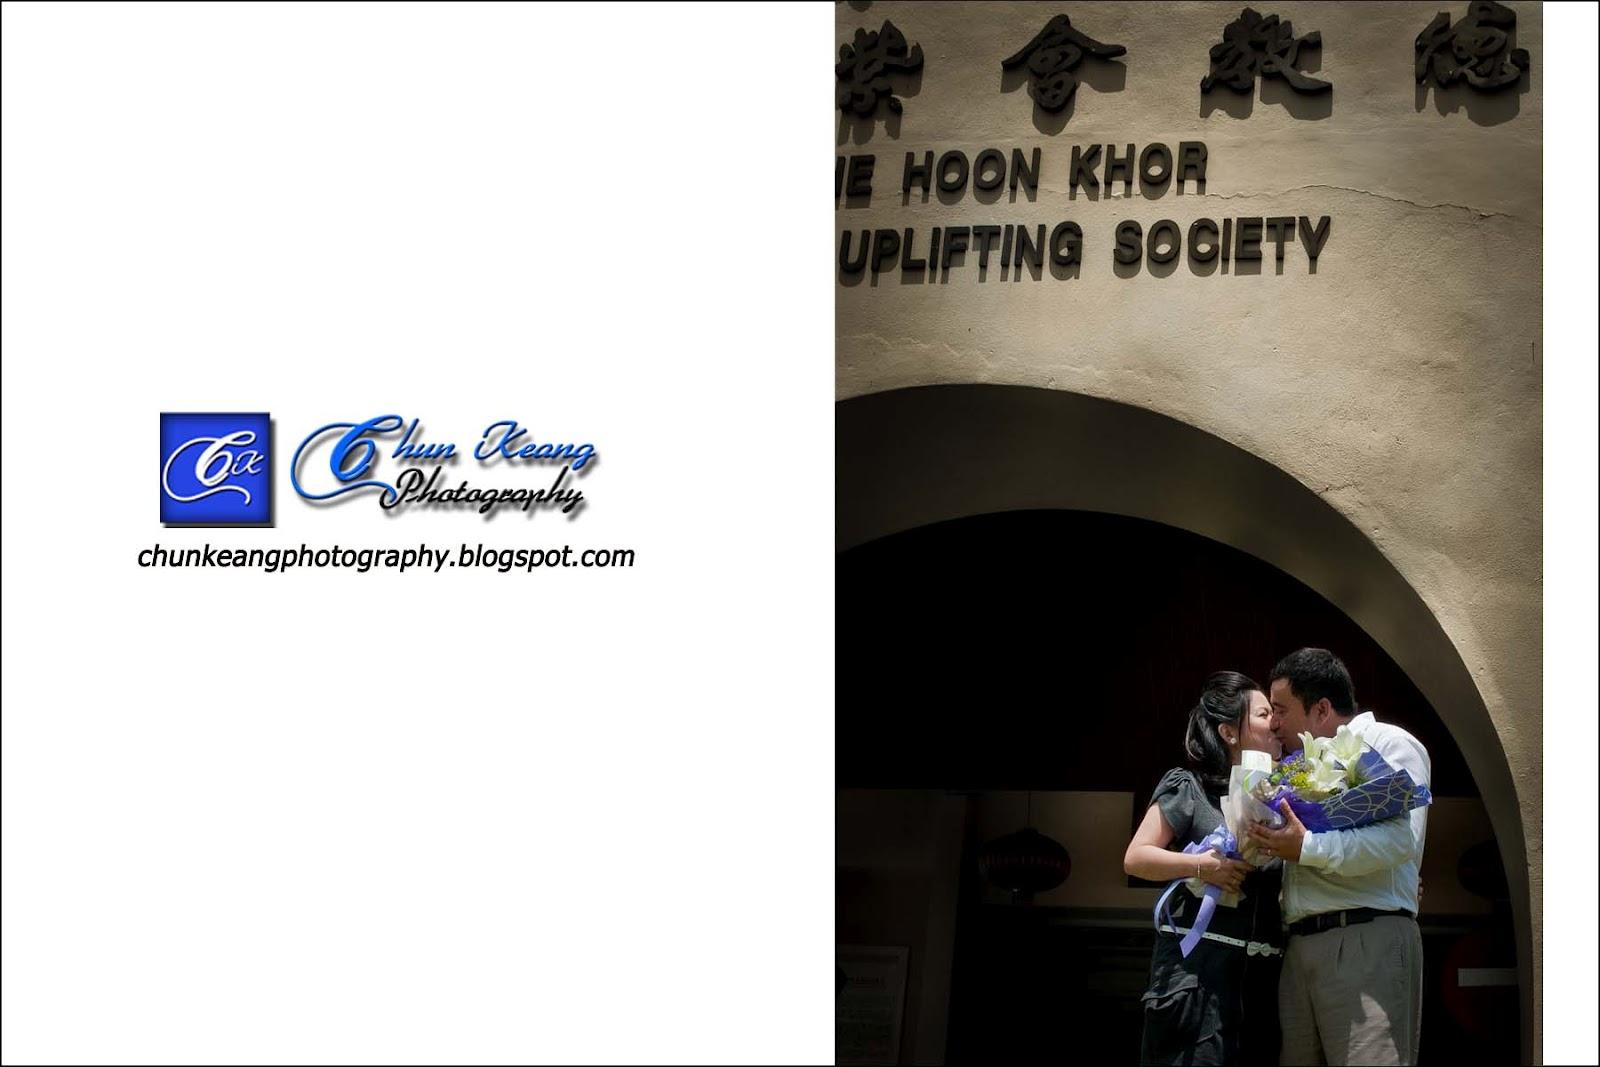 Freelance Wedding Pographer | Gene Joanne Loo Rom Photography Che Hoon Kor Moral Uplifting